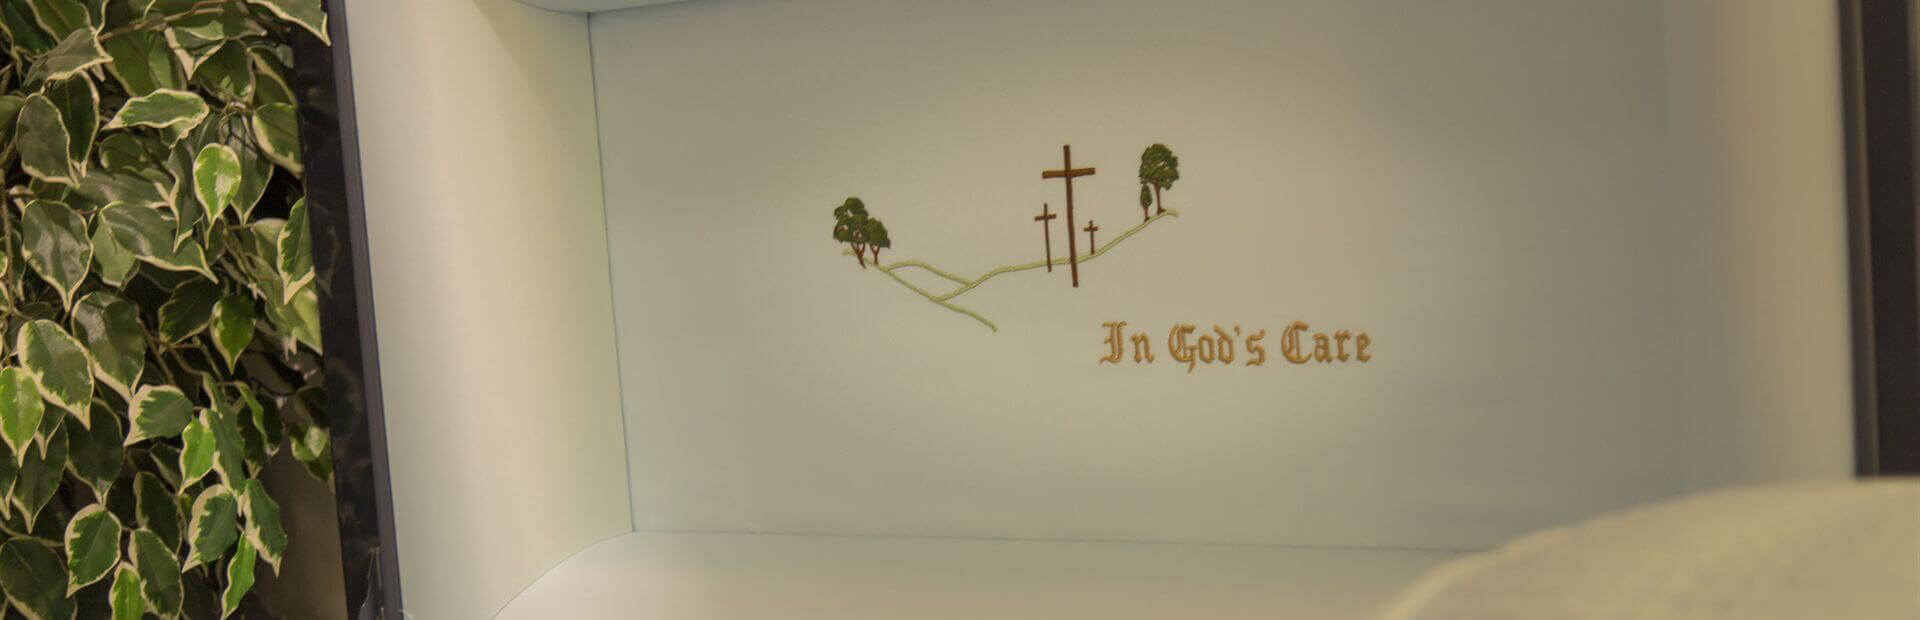 Grone-Blackburn-Shaw Funeral Directors in Amarillo, TX